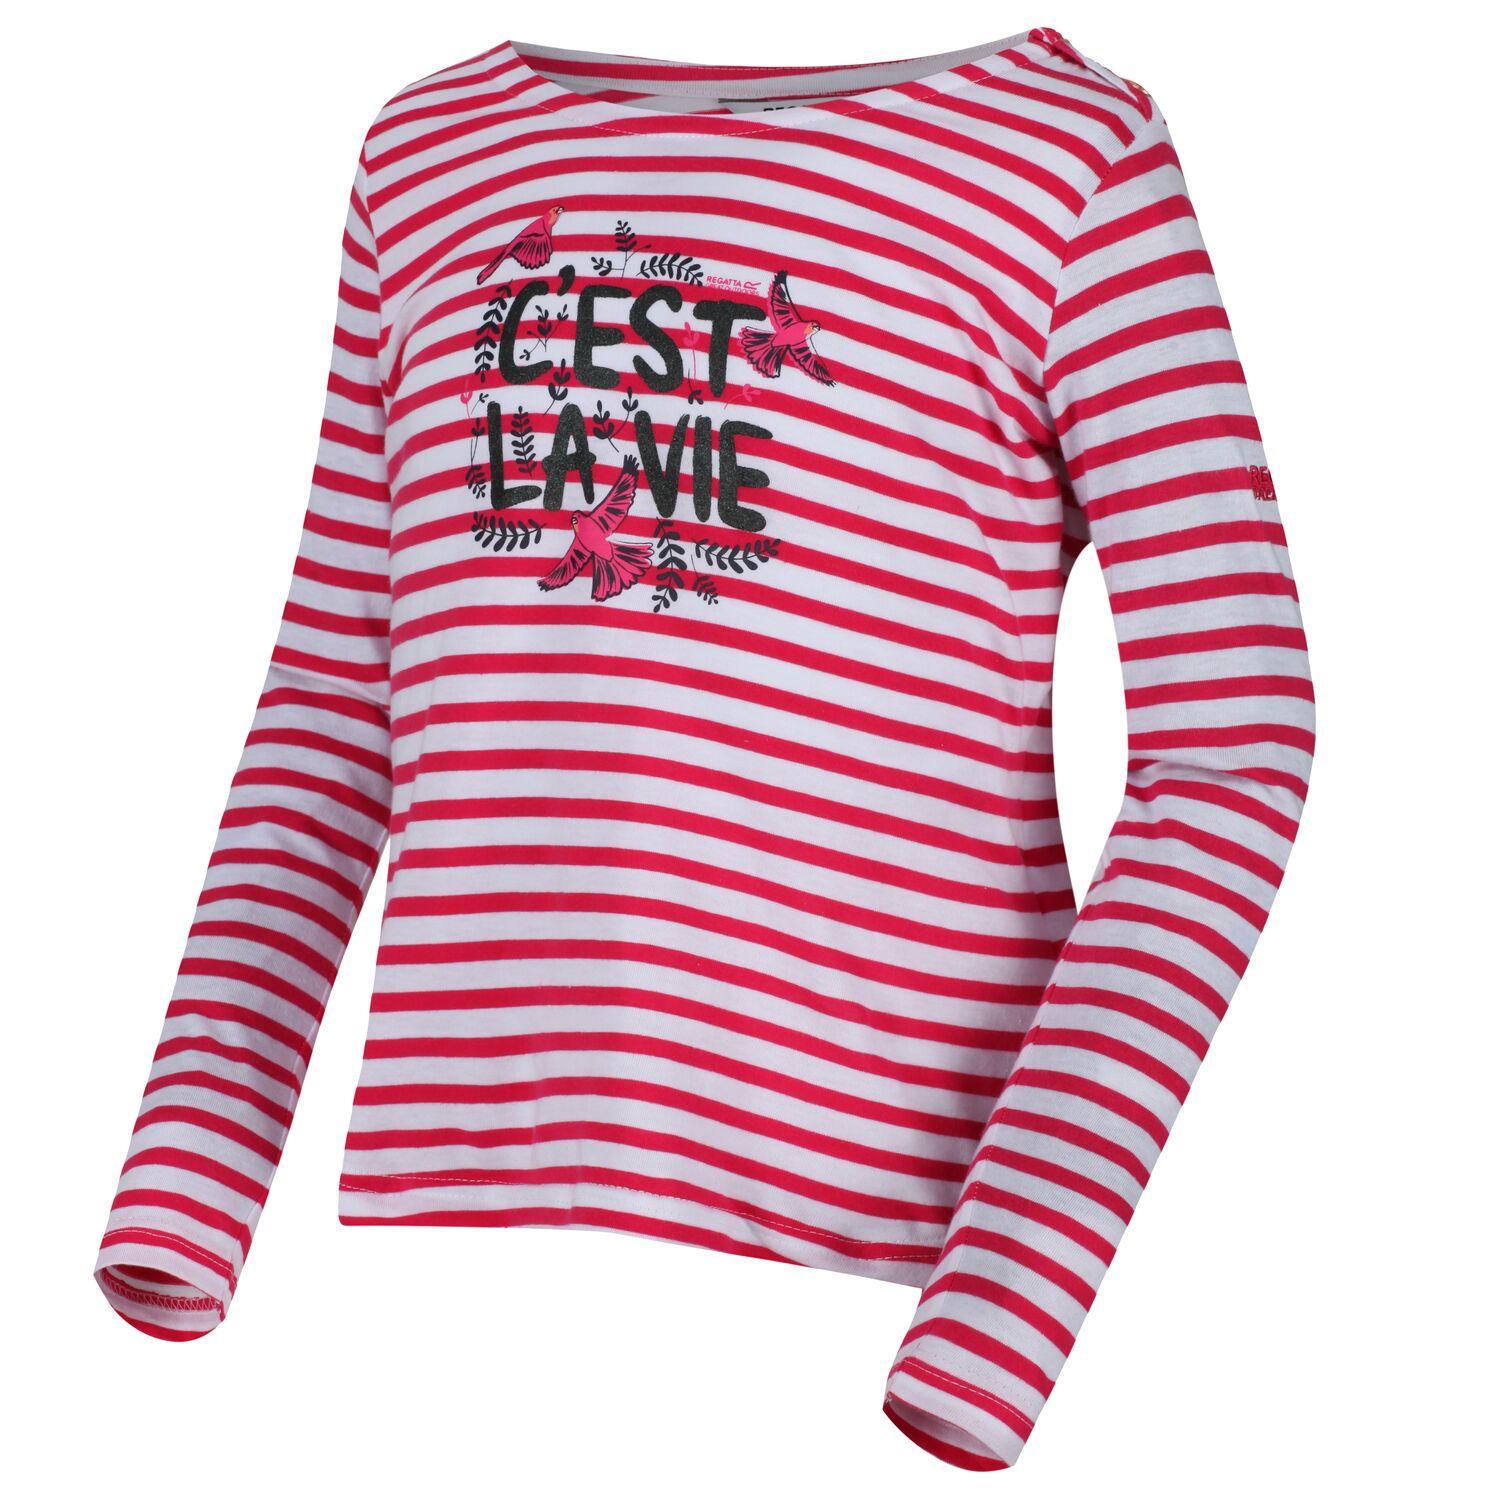 RG2777 Regatta Thunderbirds Childrens//Kids Official Peril Long Sleeved T-Shirt